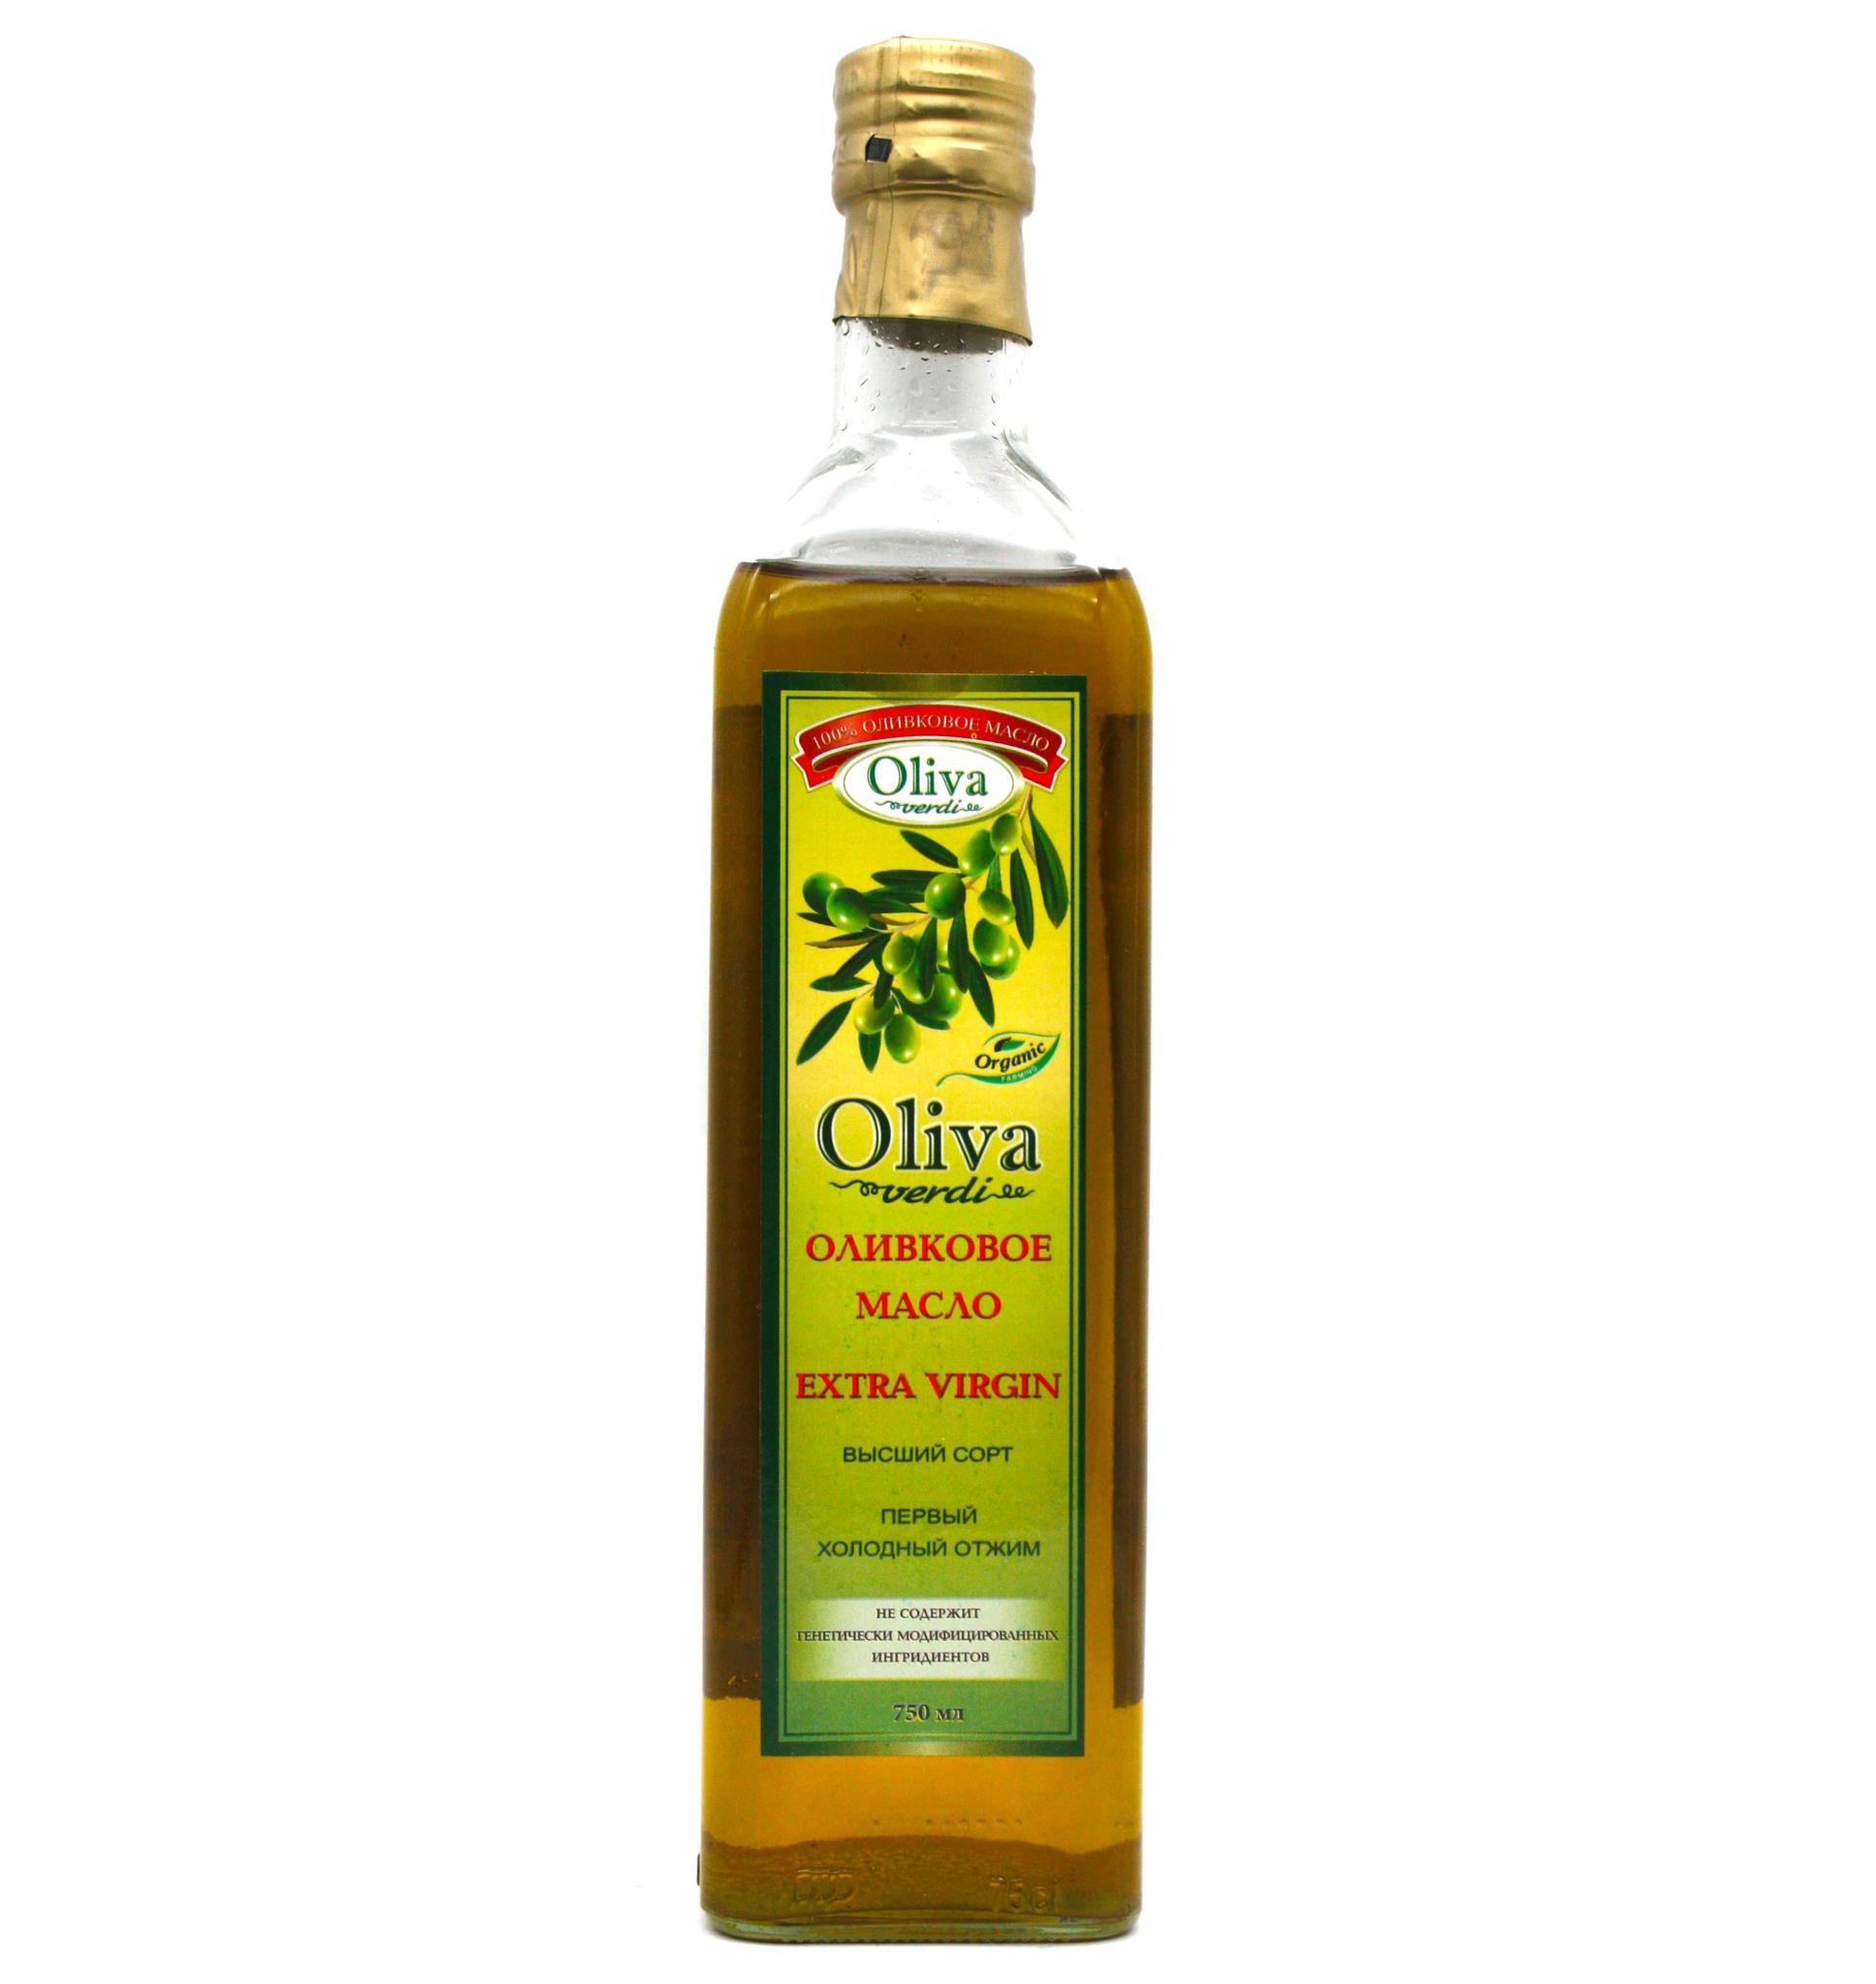 Оливковое масло Extra virgin, Oliva, 750 мл import_files_ef_ef4c5b32352511e9a9a6484d7ecee297_86940bcf40a511e9a9a8484d7ecee297.jpg